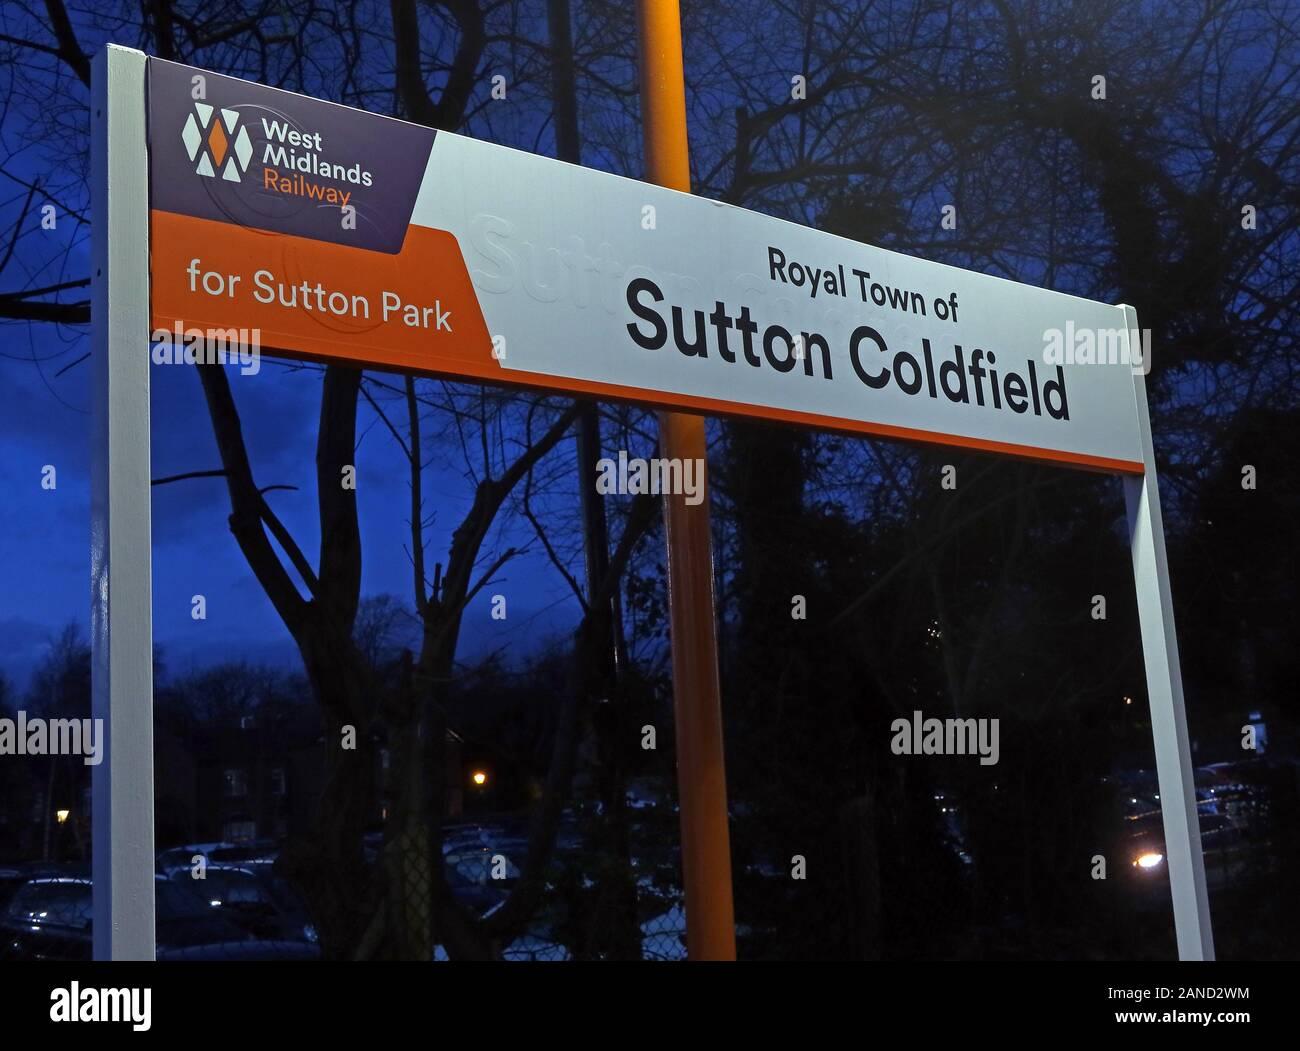 GoTonySmith,HotpixUK,@Hotpixuk,Sutton Coldfield,Royal,town,West Midlands,England,Midlands,West Midlands Railway,train,trains,public transport,station,rail,railway,B74,dusk,night,nighttime,night time,sign,rail network,network,for Sutton Park,town centre,affluent,suburb,urban,Royal Town Of Sutton Coldfield,Sutton Coldfield railway Station,Sutton Coldfield Station,railway Station